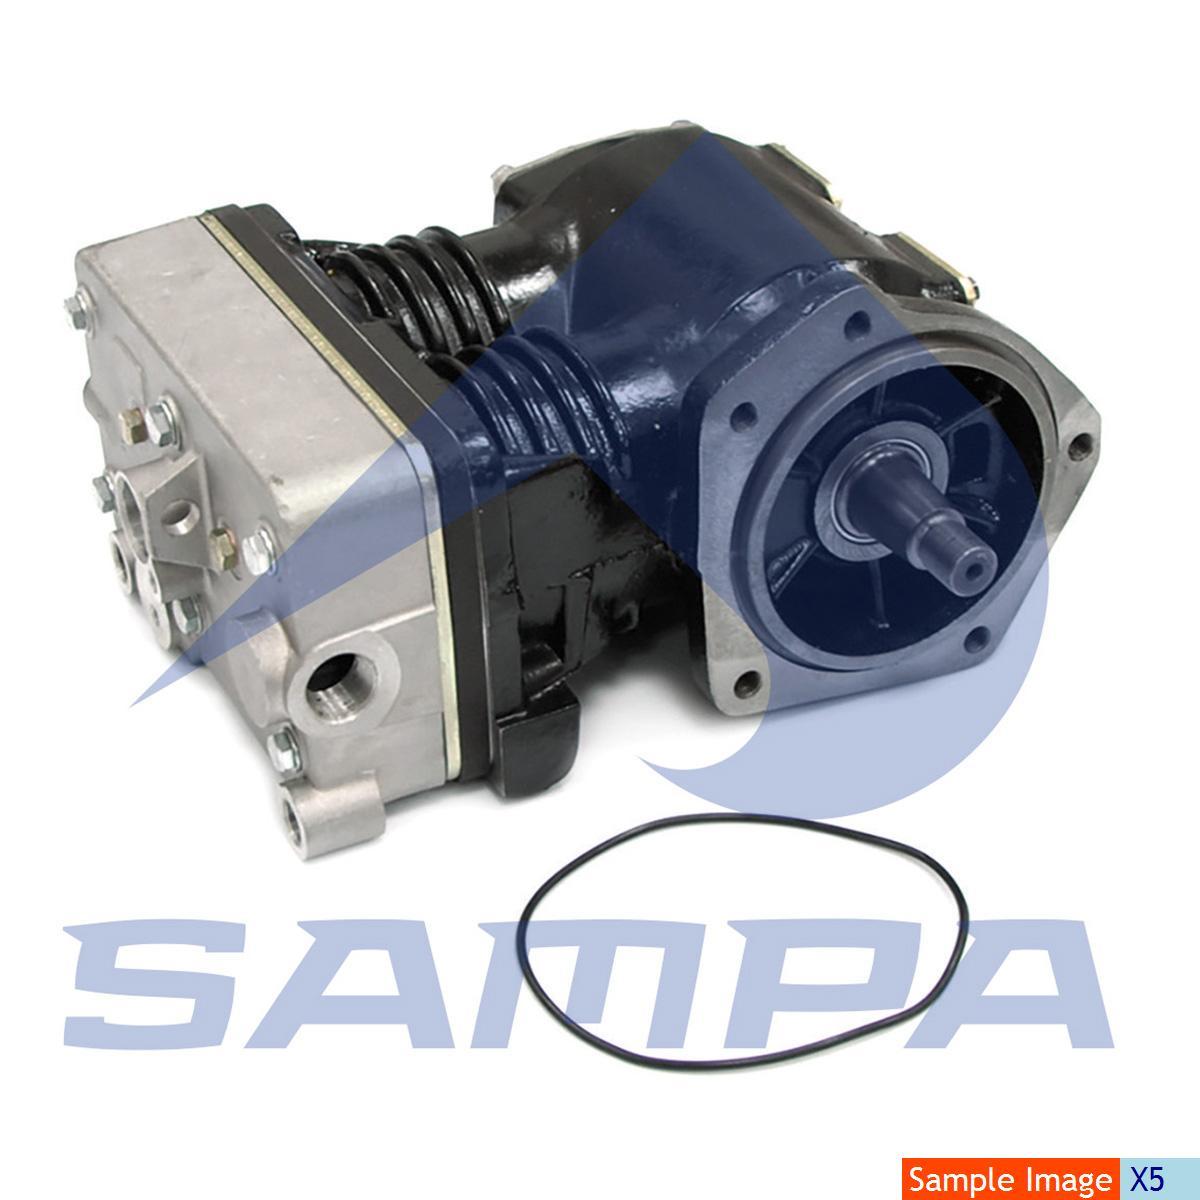 Compressor, Volvo, Compressed Air System